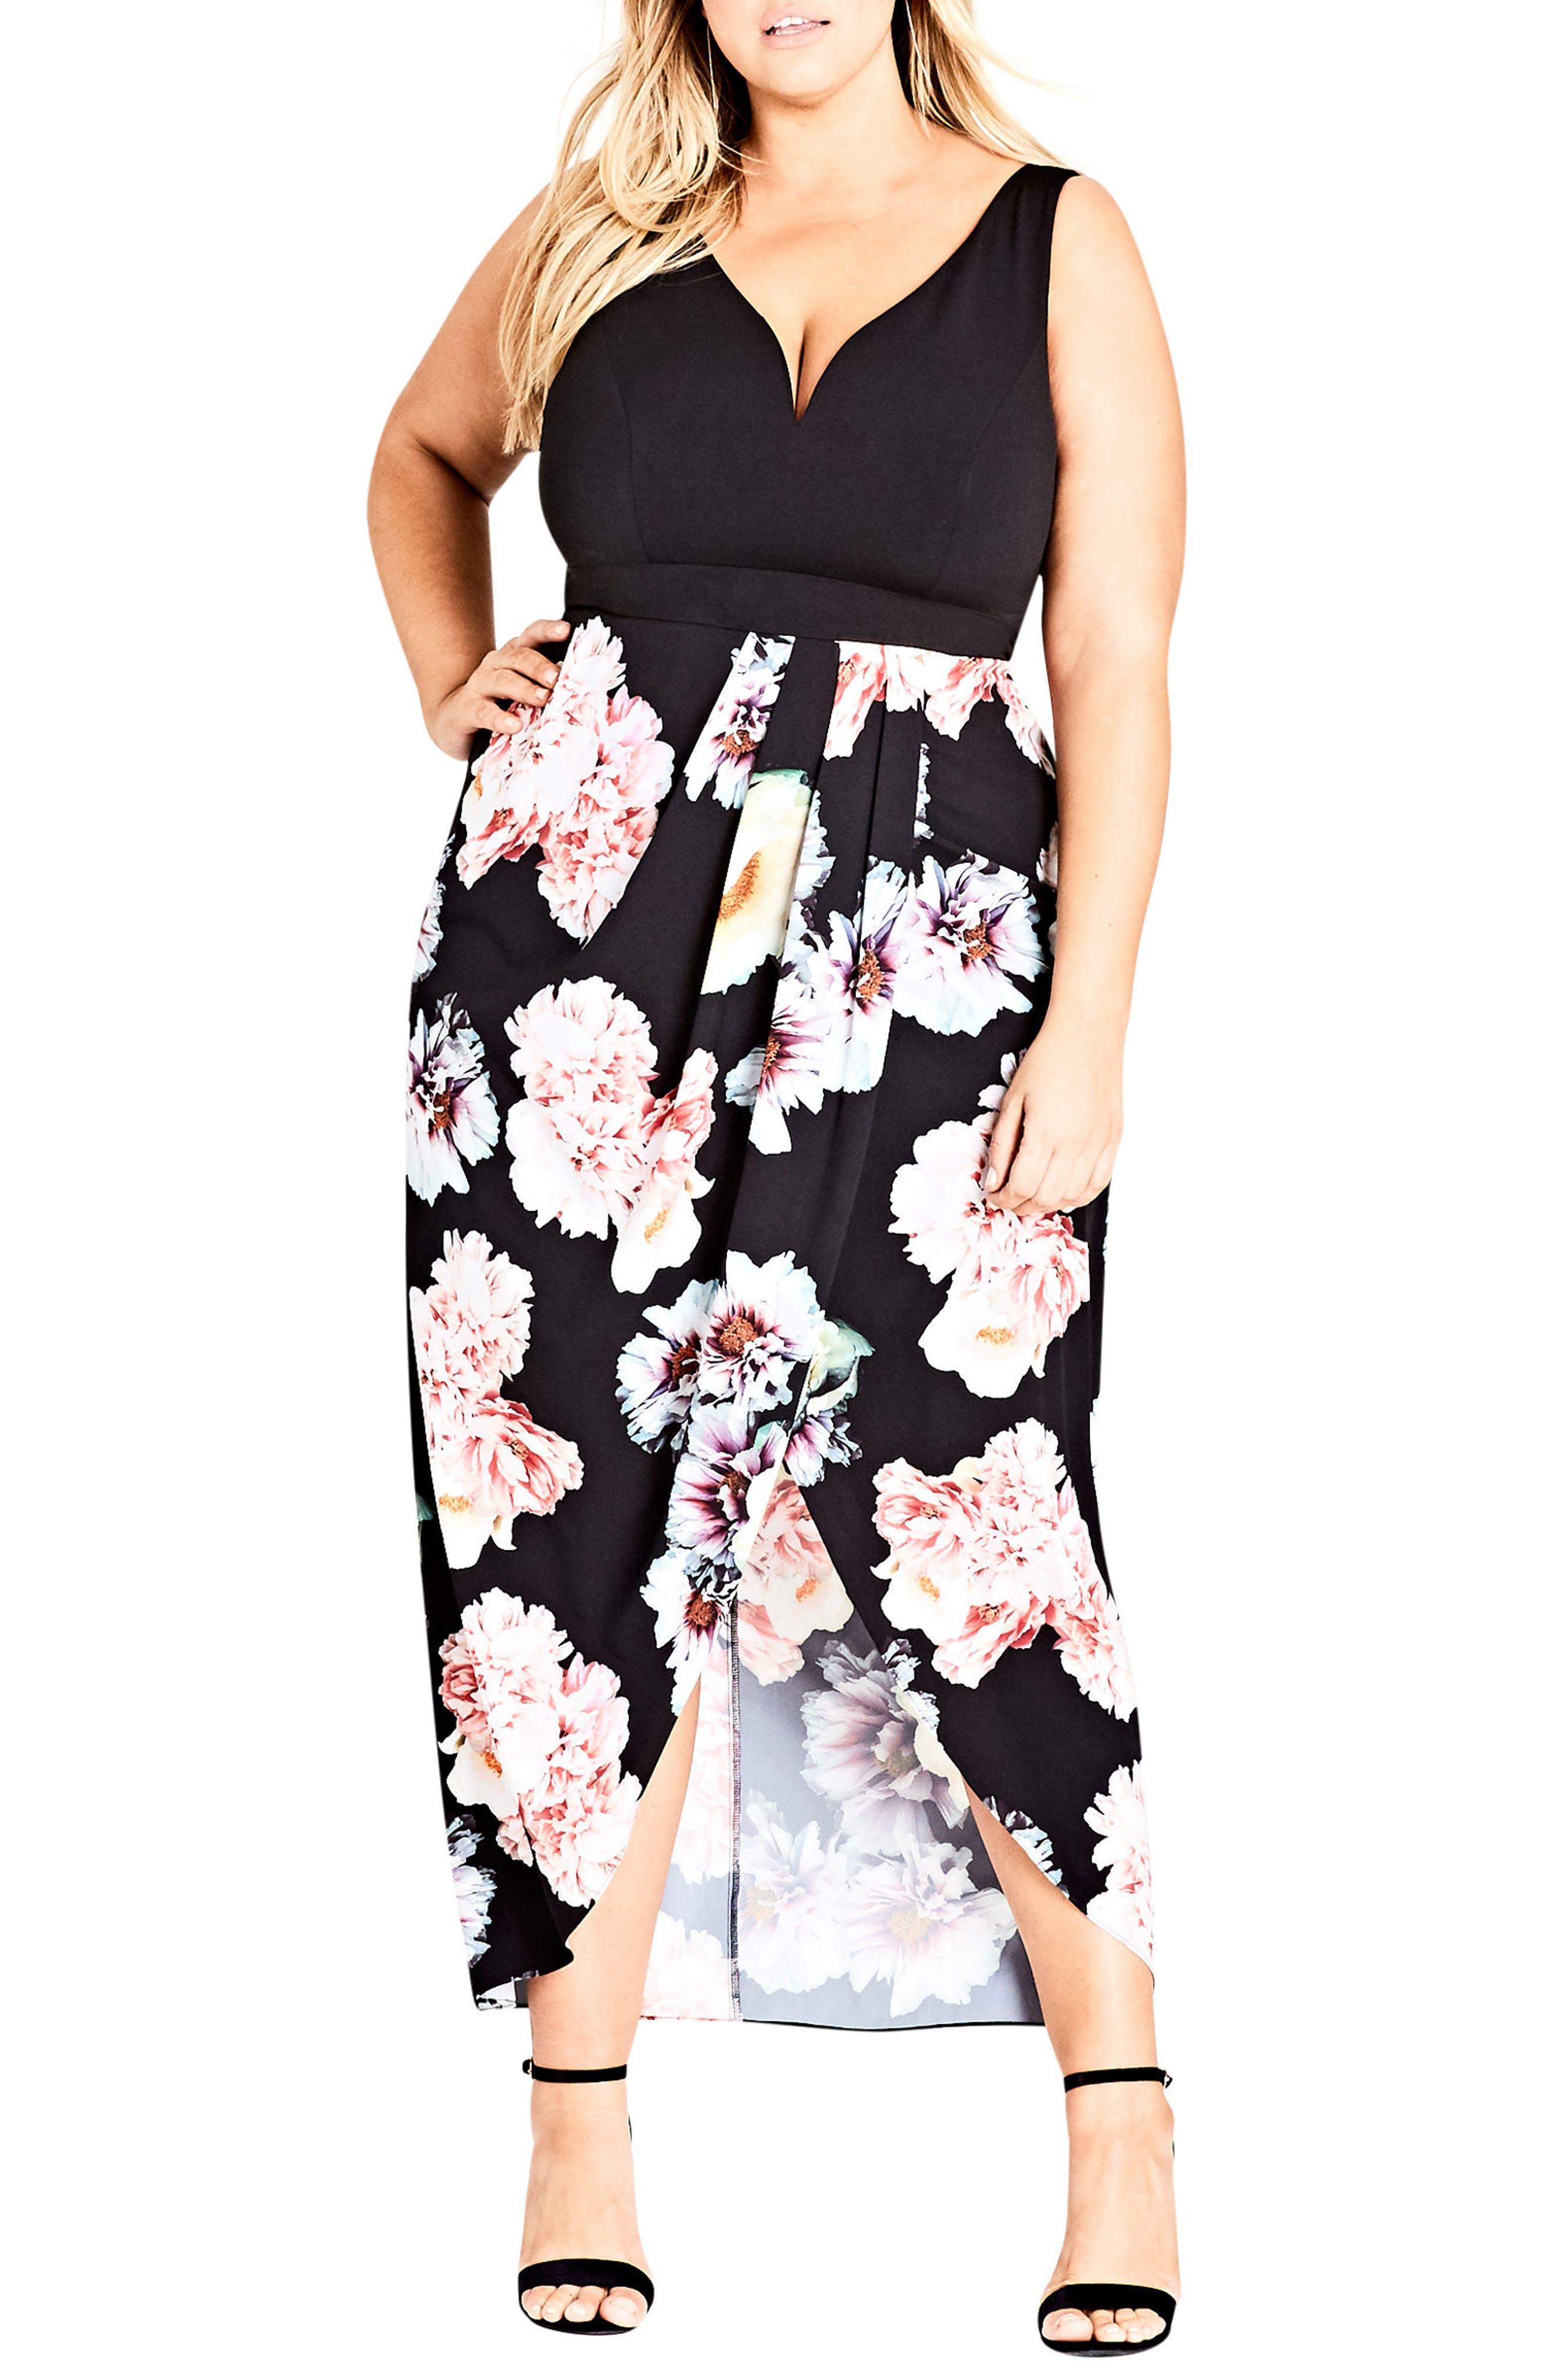 Plus Size City Chic Beautiful Lies Maxi Dress, Black